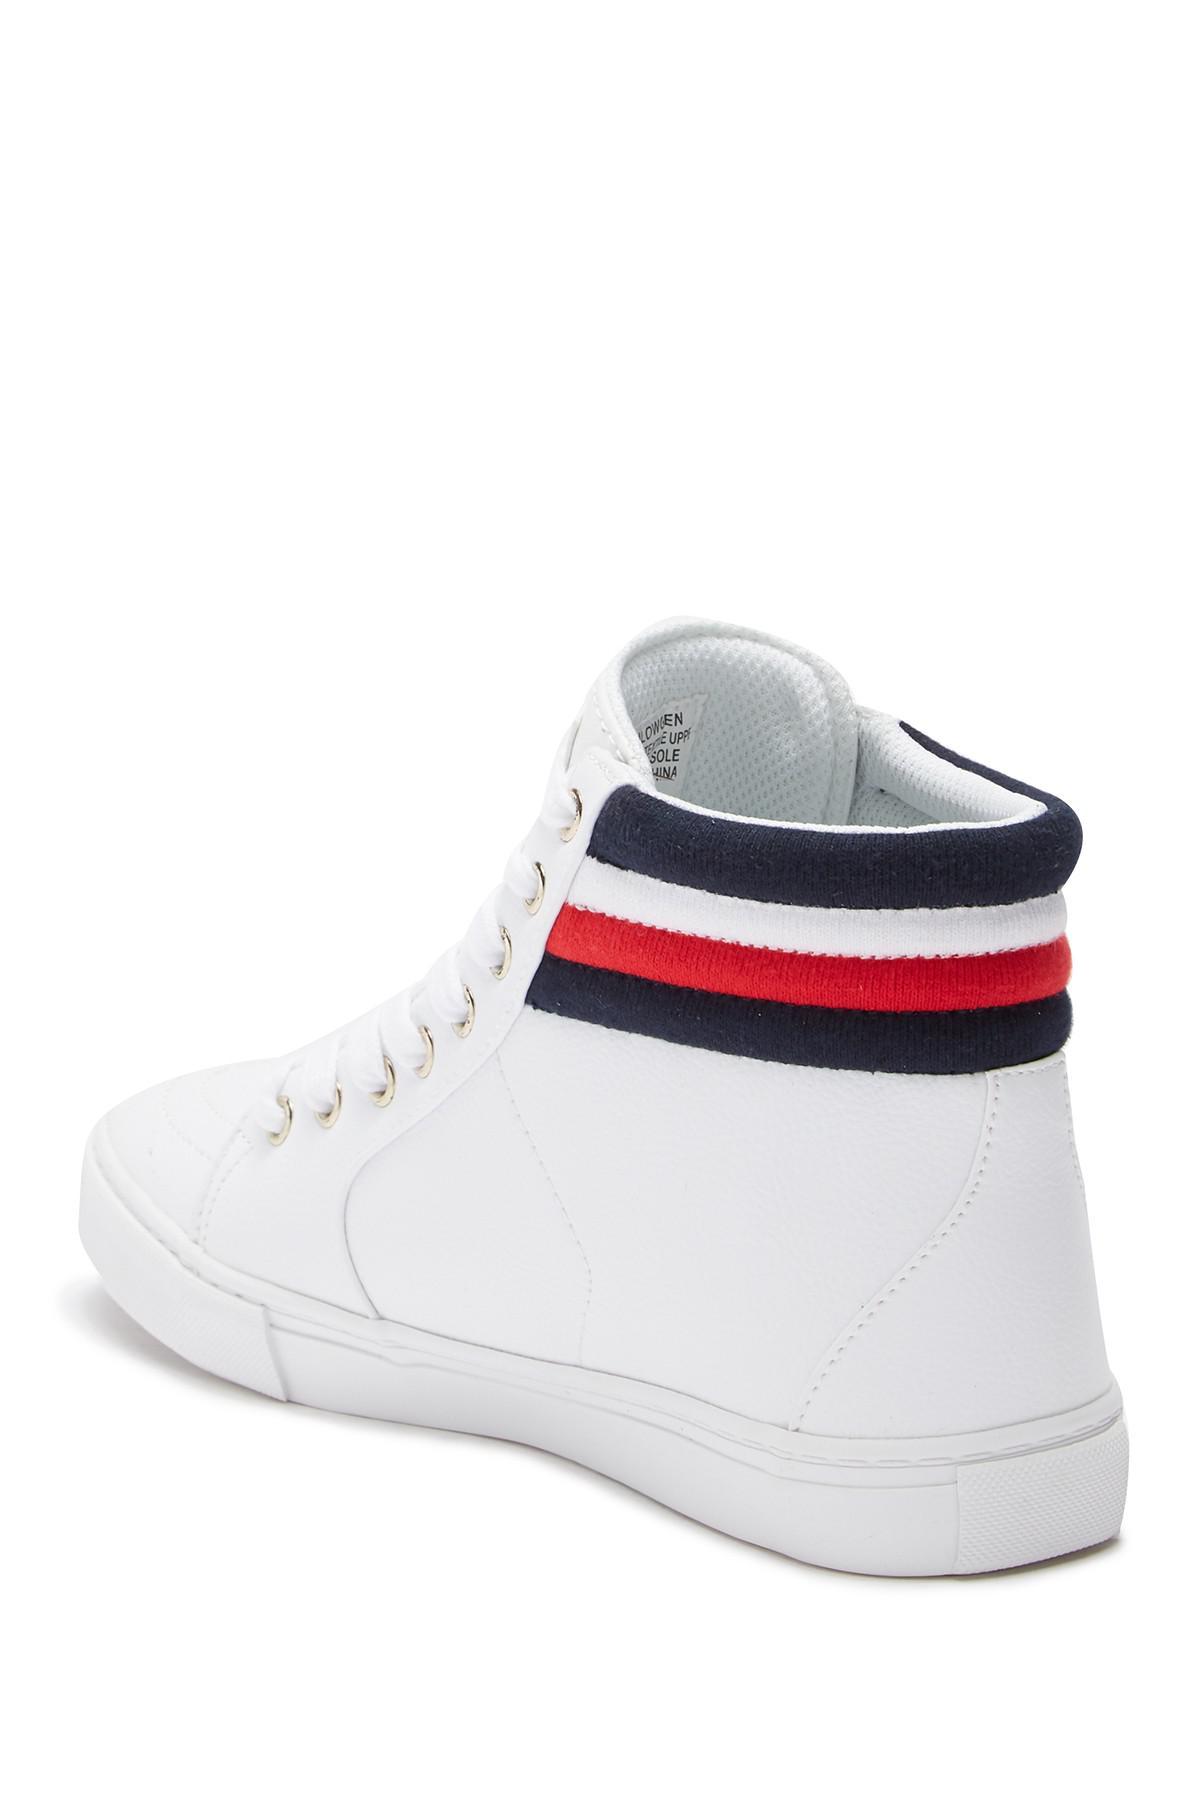 8ae02df05f4f0 Tommy Hilfiger - White Lowgen High Top Sneaker - Lyst. View fullscreen